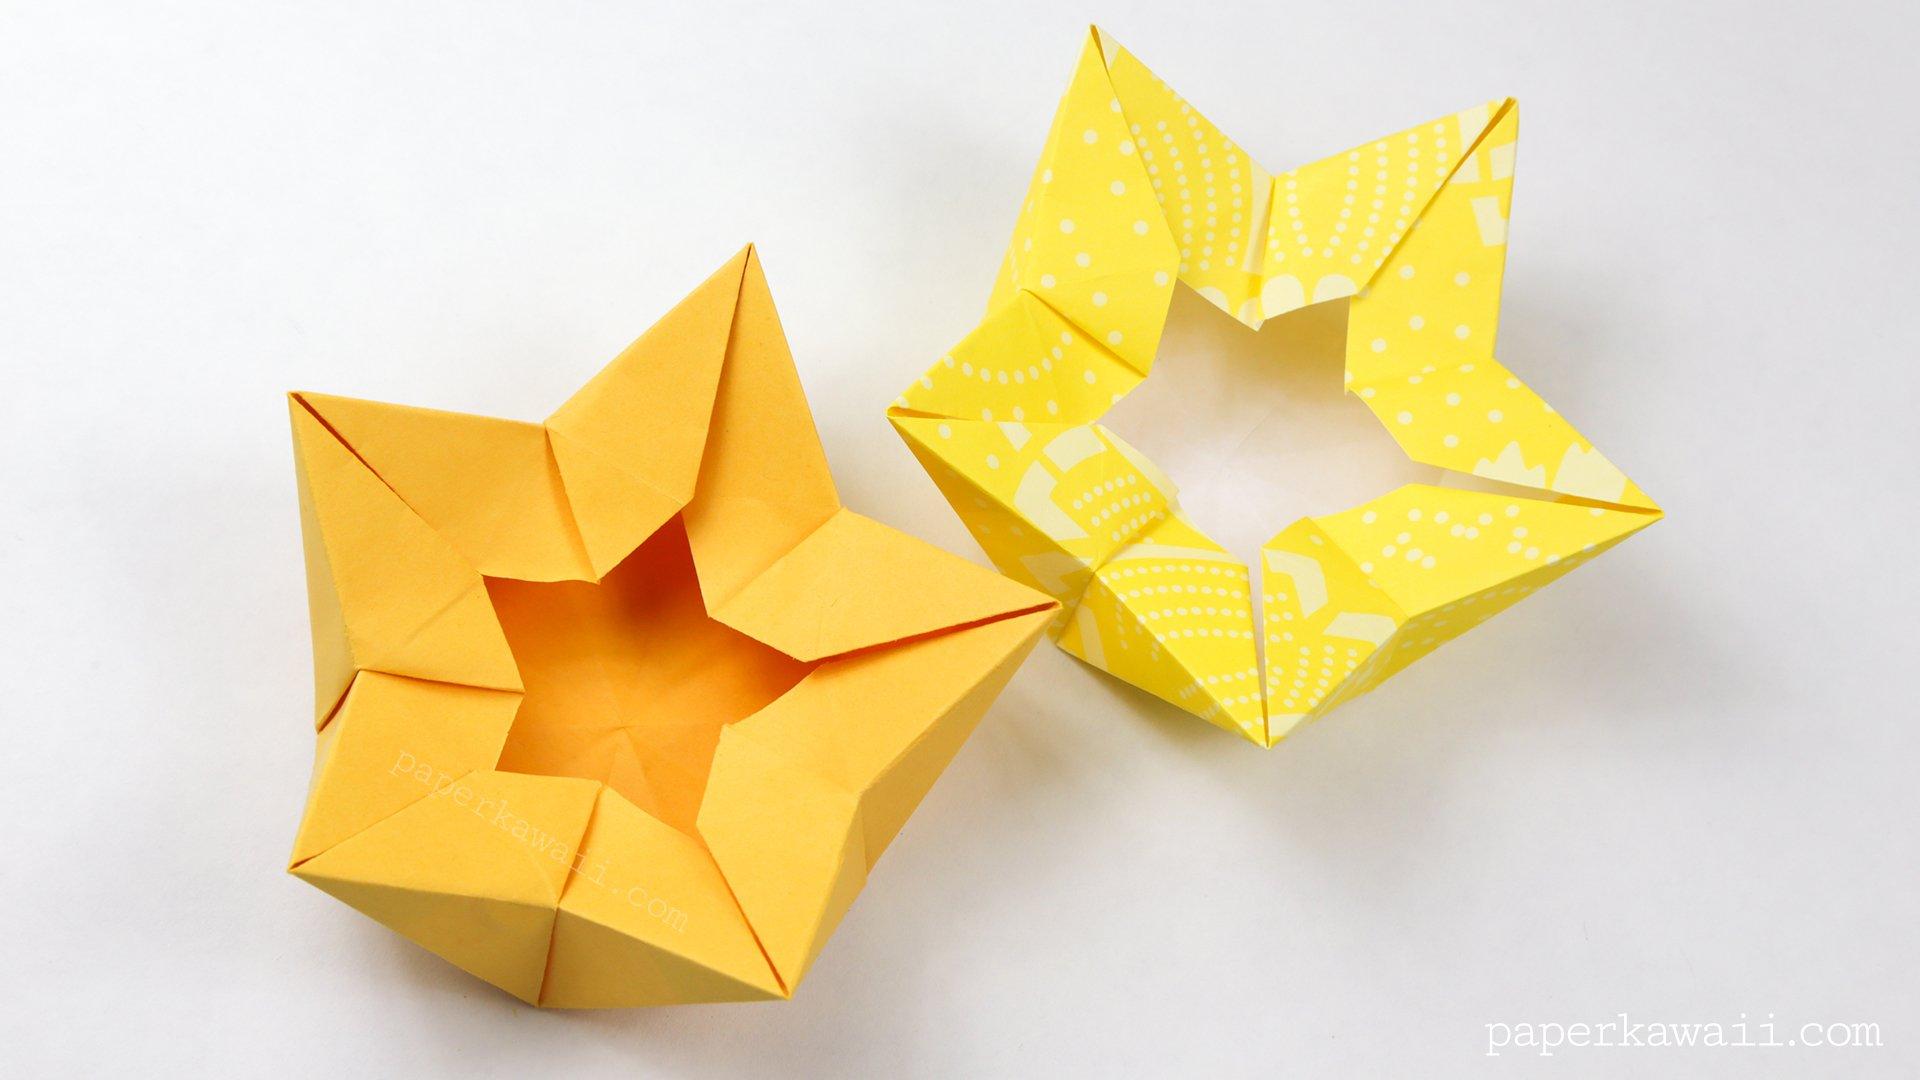 Origami star flower crown bowl tutorial paper kawaii scissors to make the pentagon origami star flower mightylinksfo Images